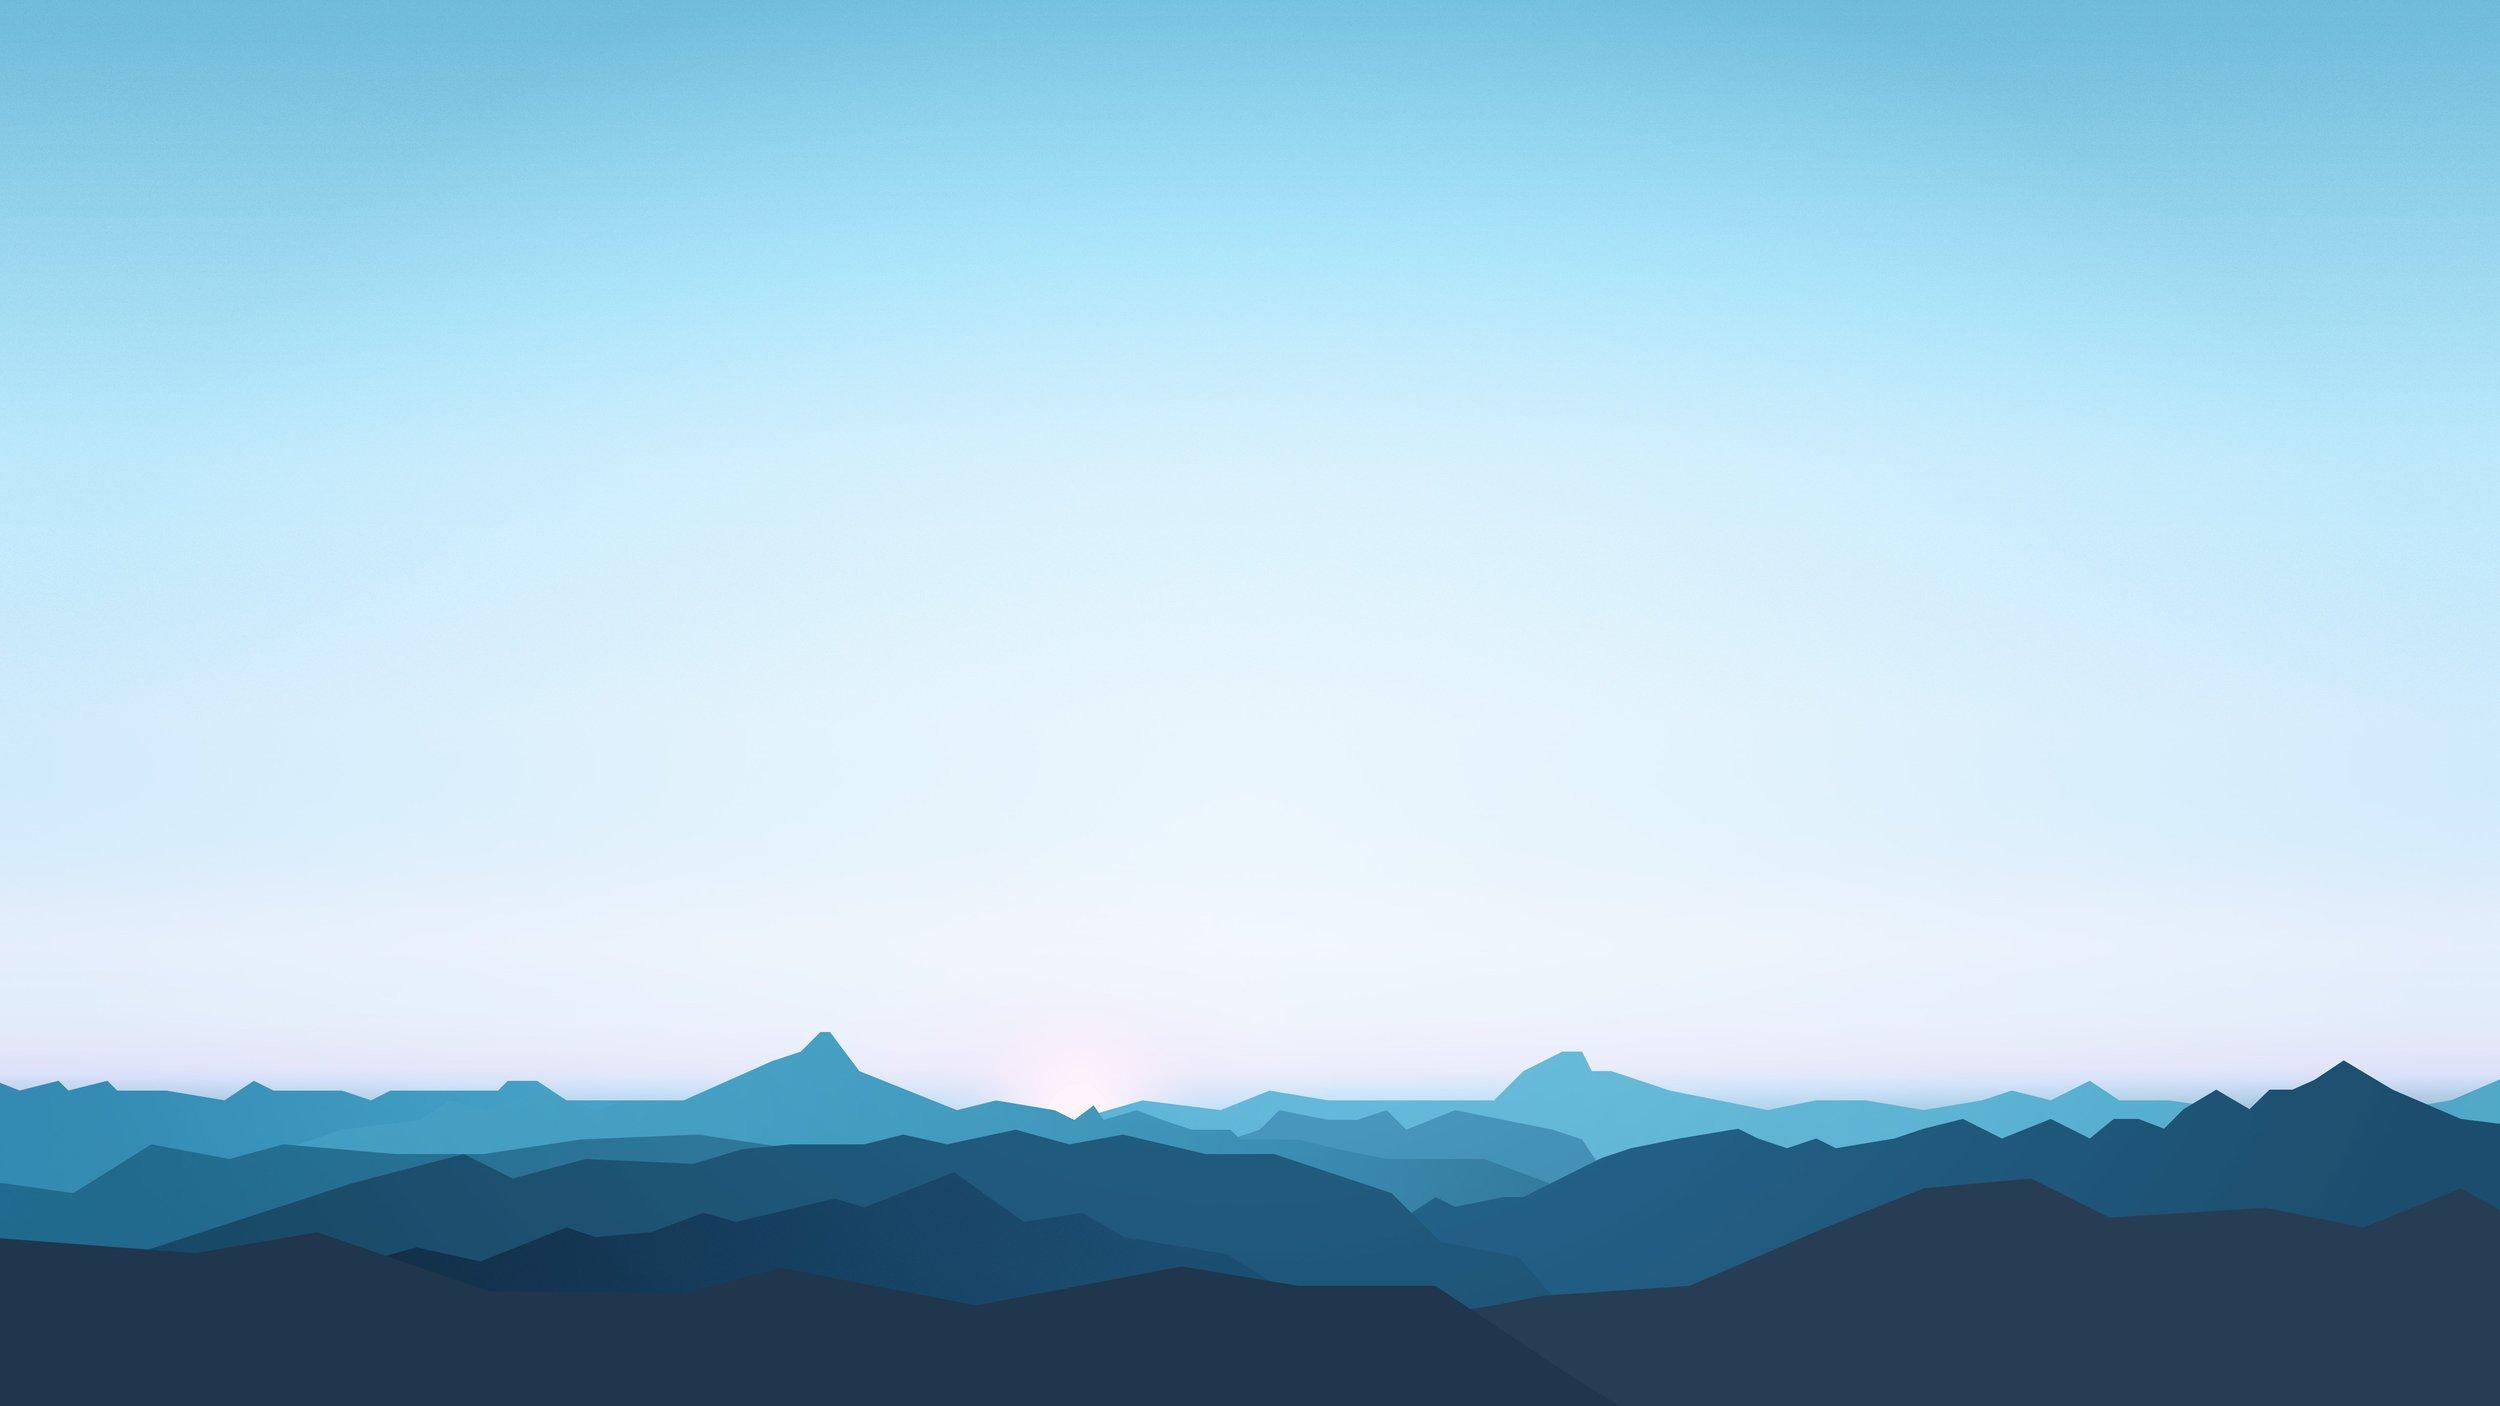 Minimal Mountains Wallpaper Pack For Galaxy S9 Iphone X 5k Imac Dargadgetz